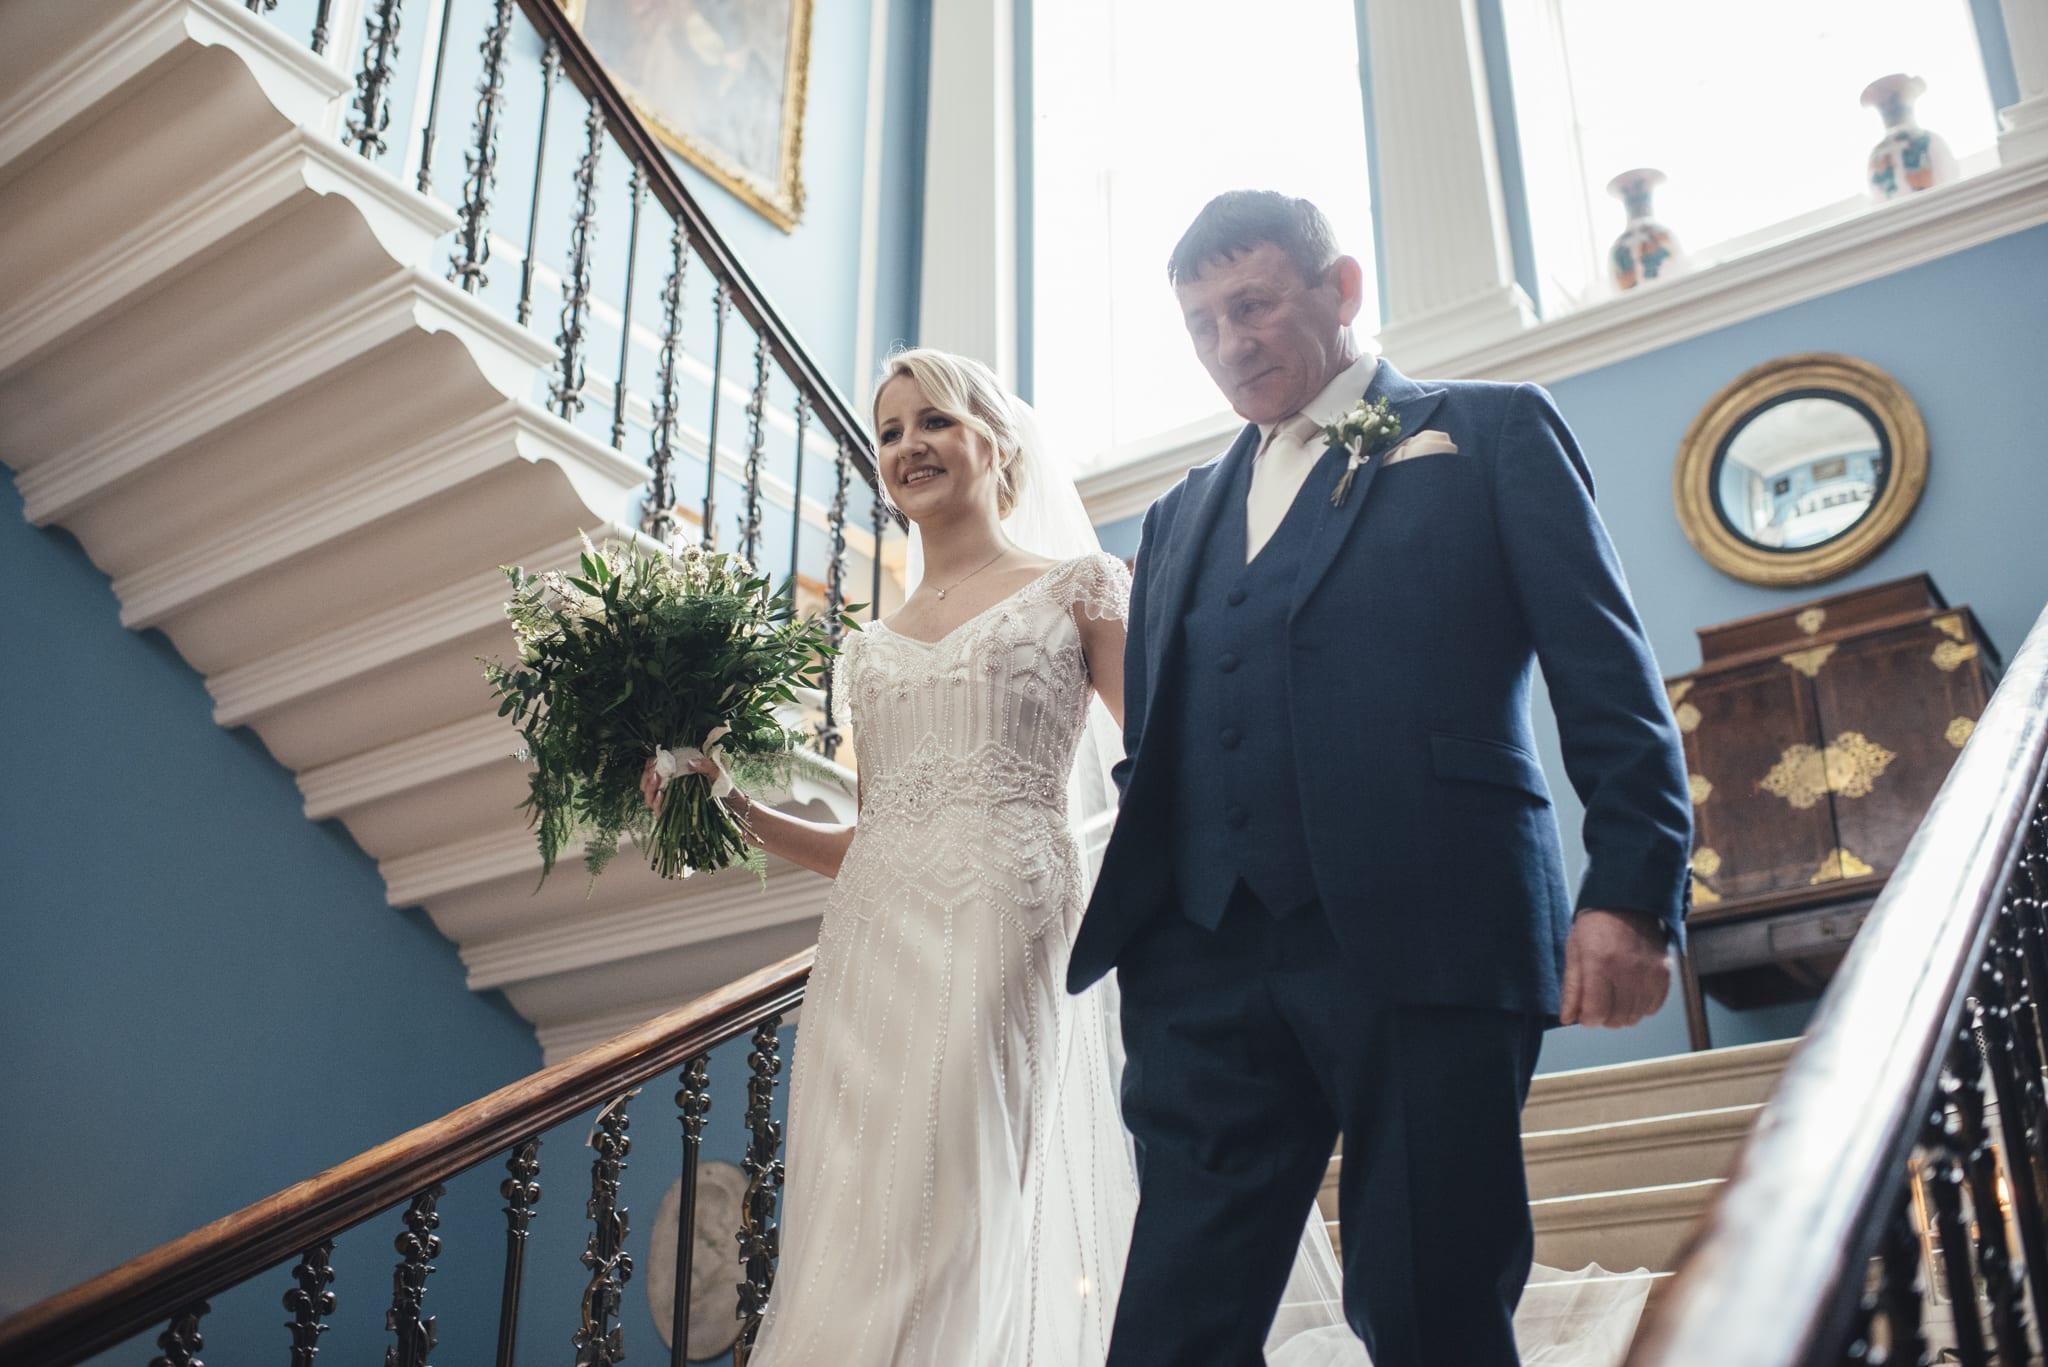 Drenagh Estate Wedding Photography blog Megan & Marty